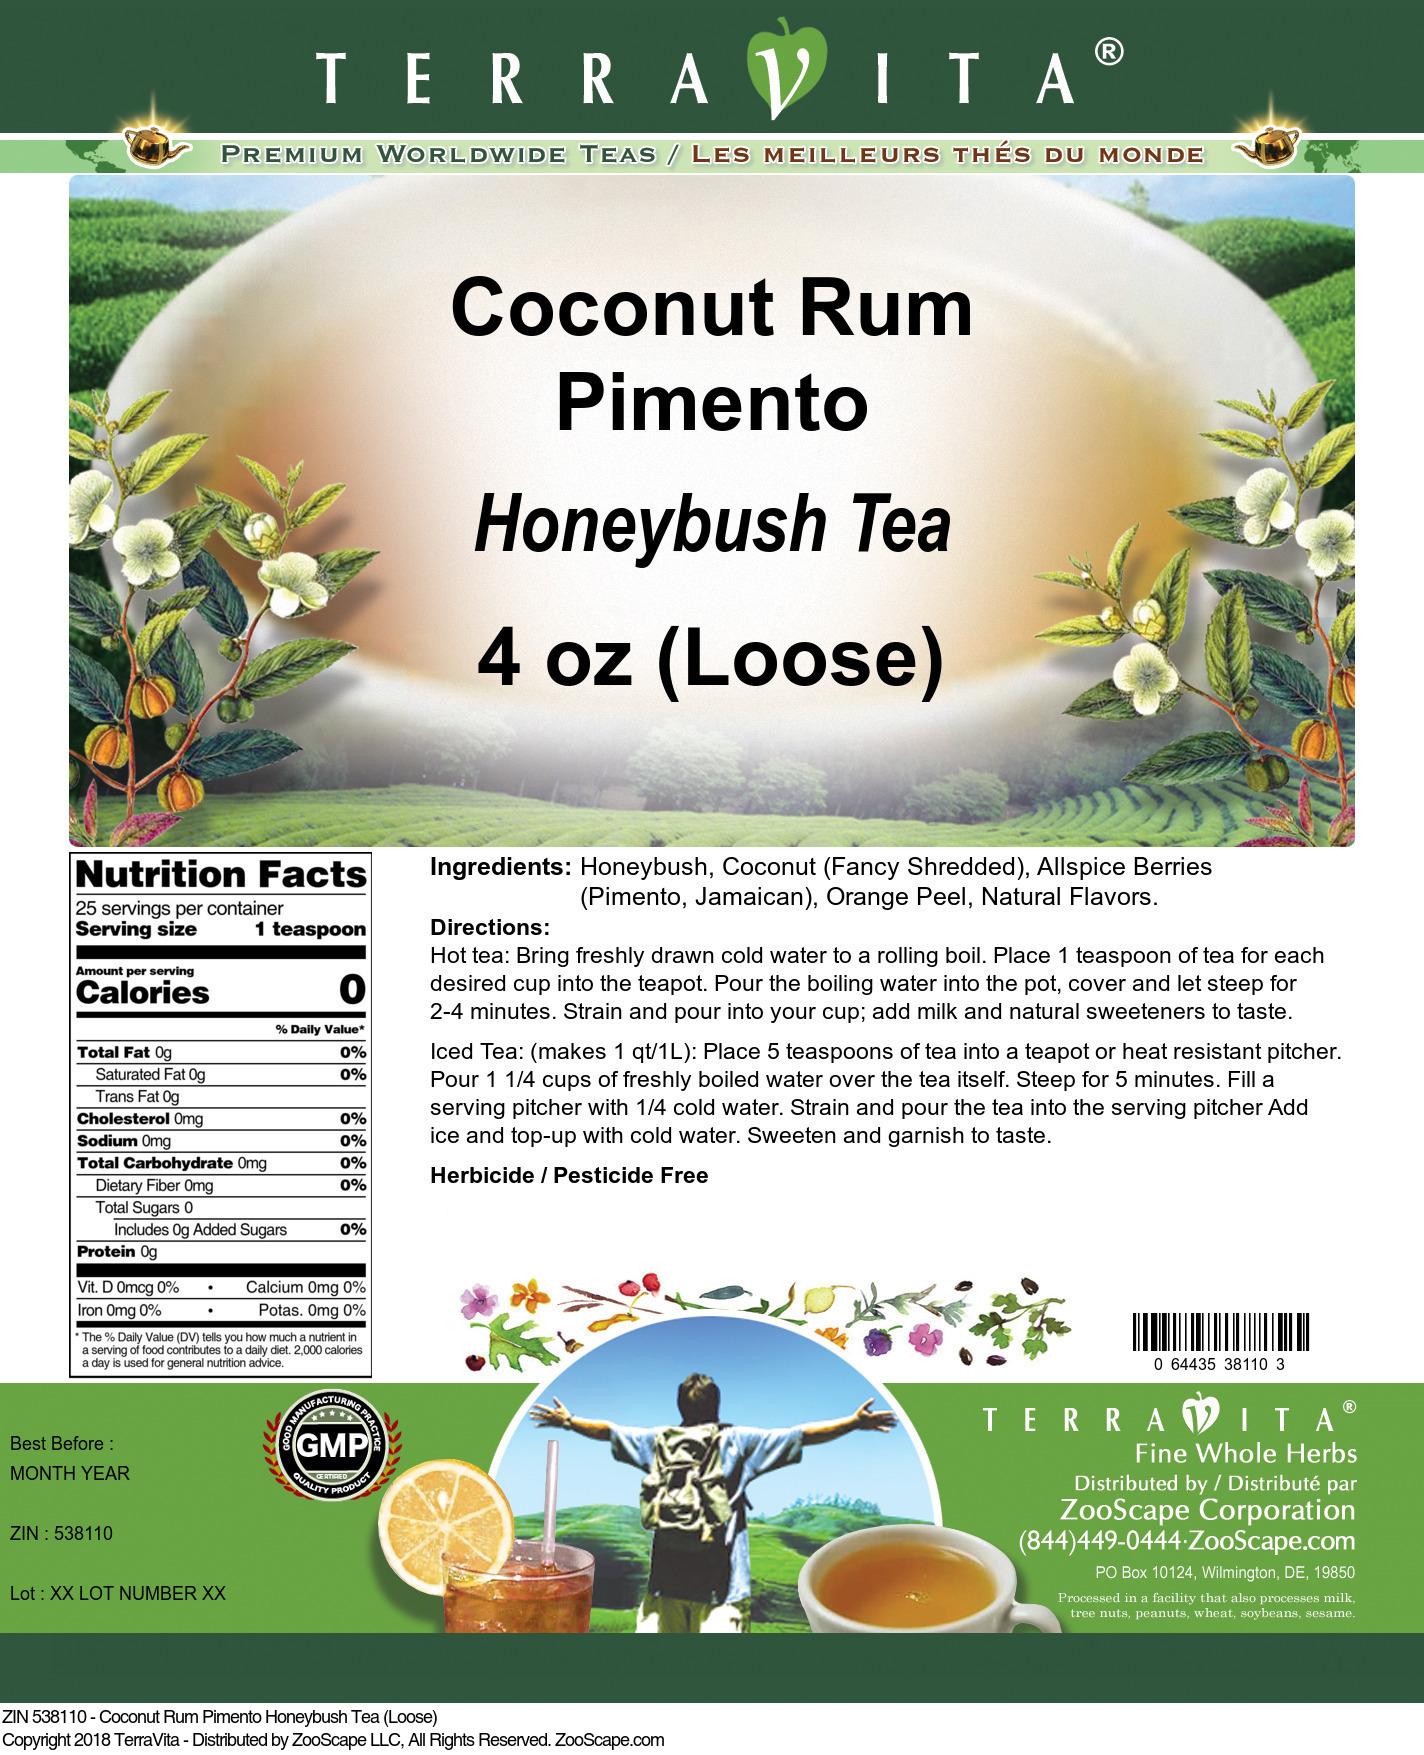 Coconut Rum Pimento Honeybush Tea (Loose)